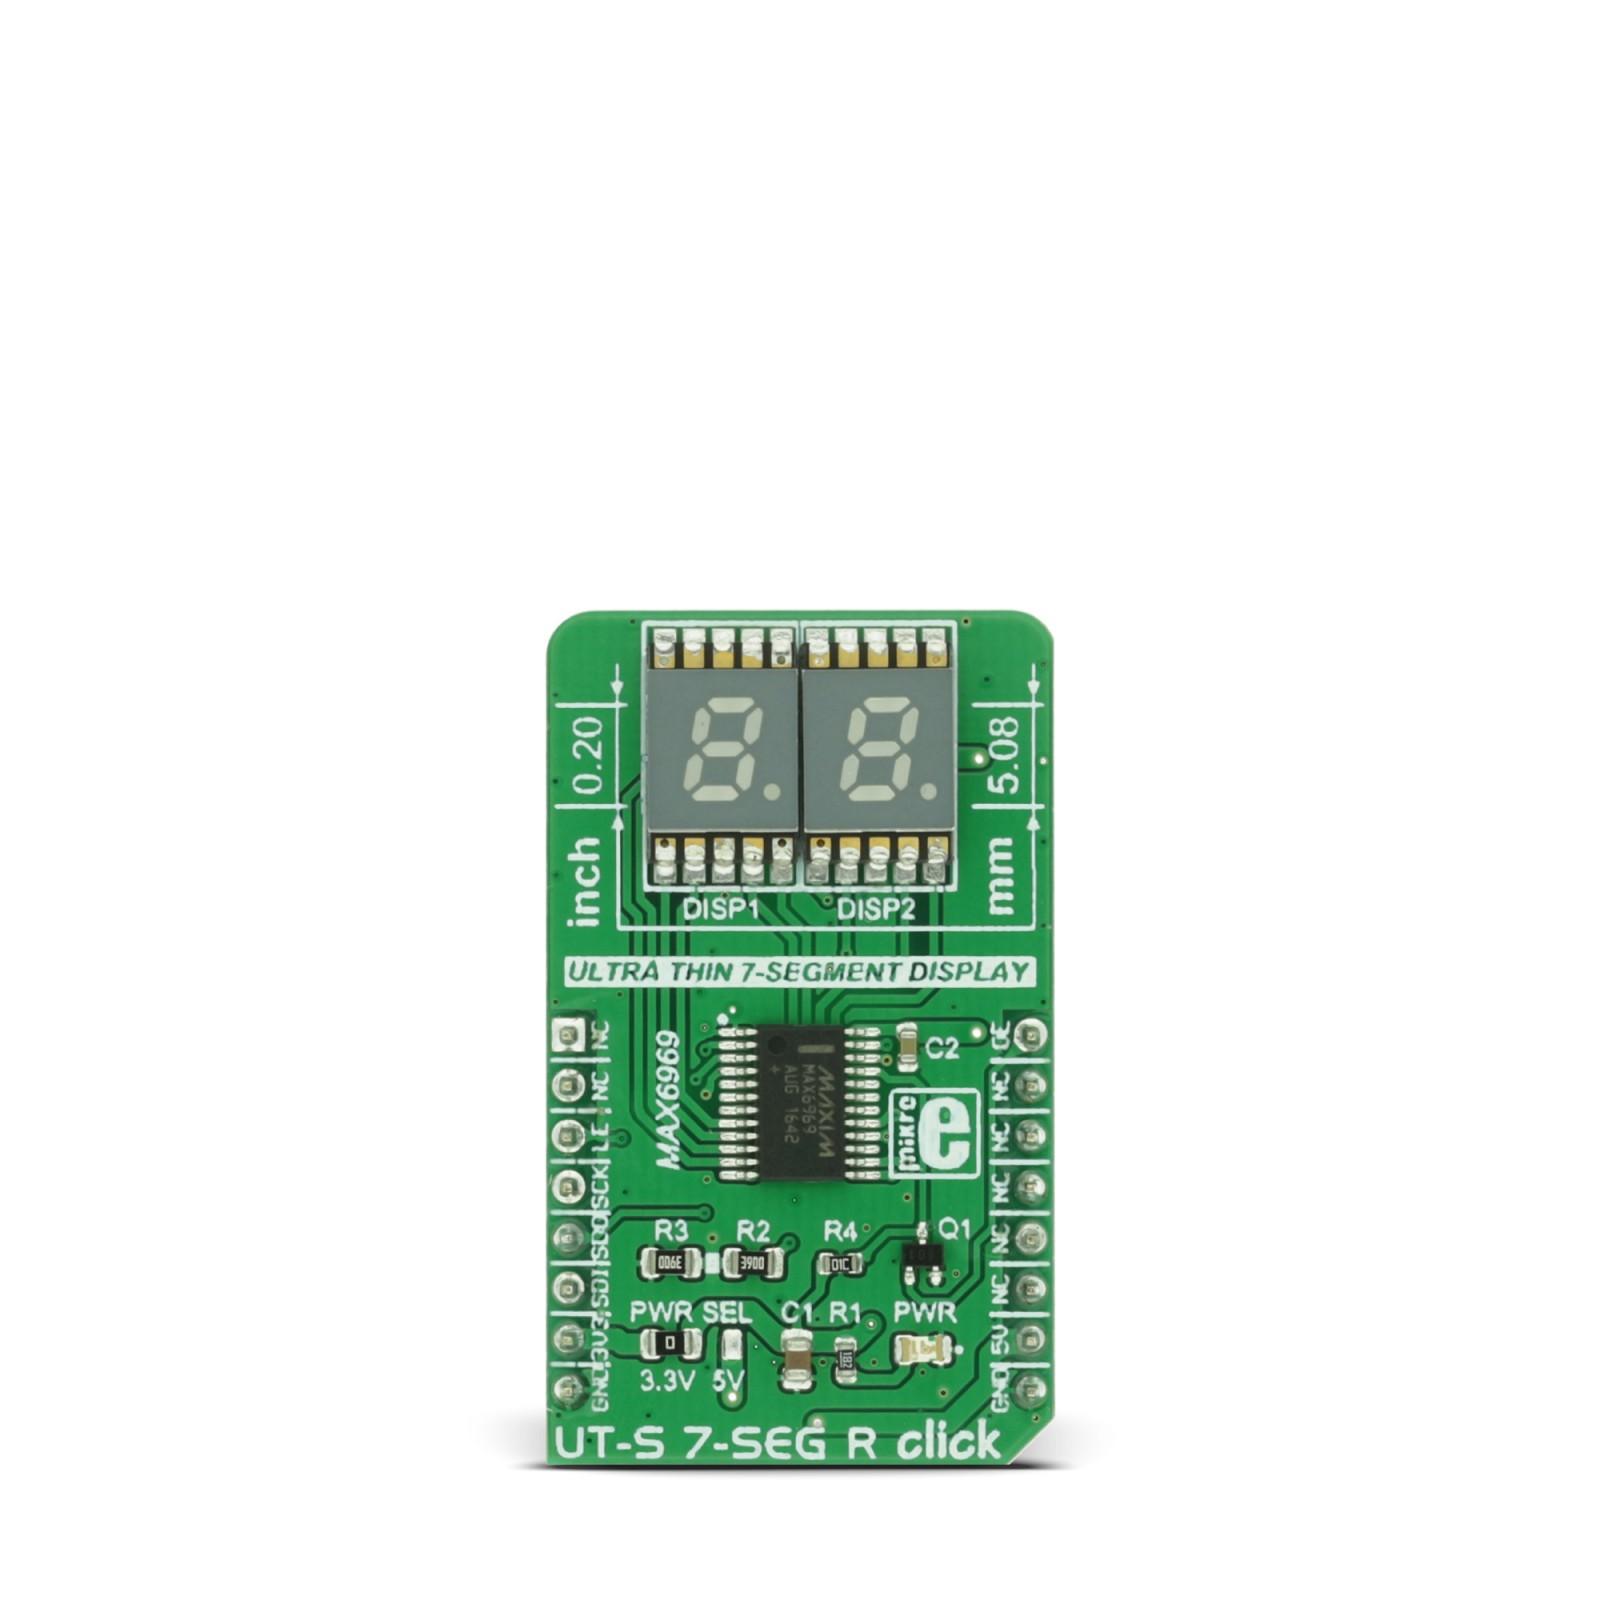 Ut S 7 Seg R Click Mikroelektronika Logic High And Low Indicator On Segment Display Circuit Diagram Mgctlbxnmzp Mgctlbxv5112 Mgctlbxlc Mgctlbxpprestashop